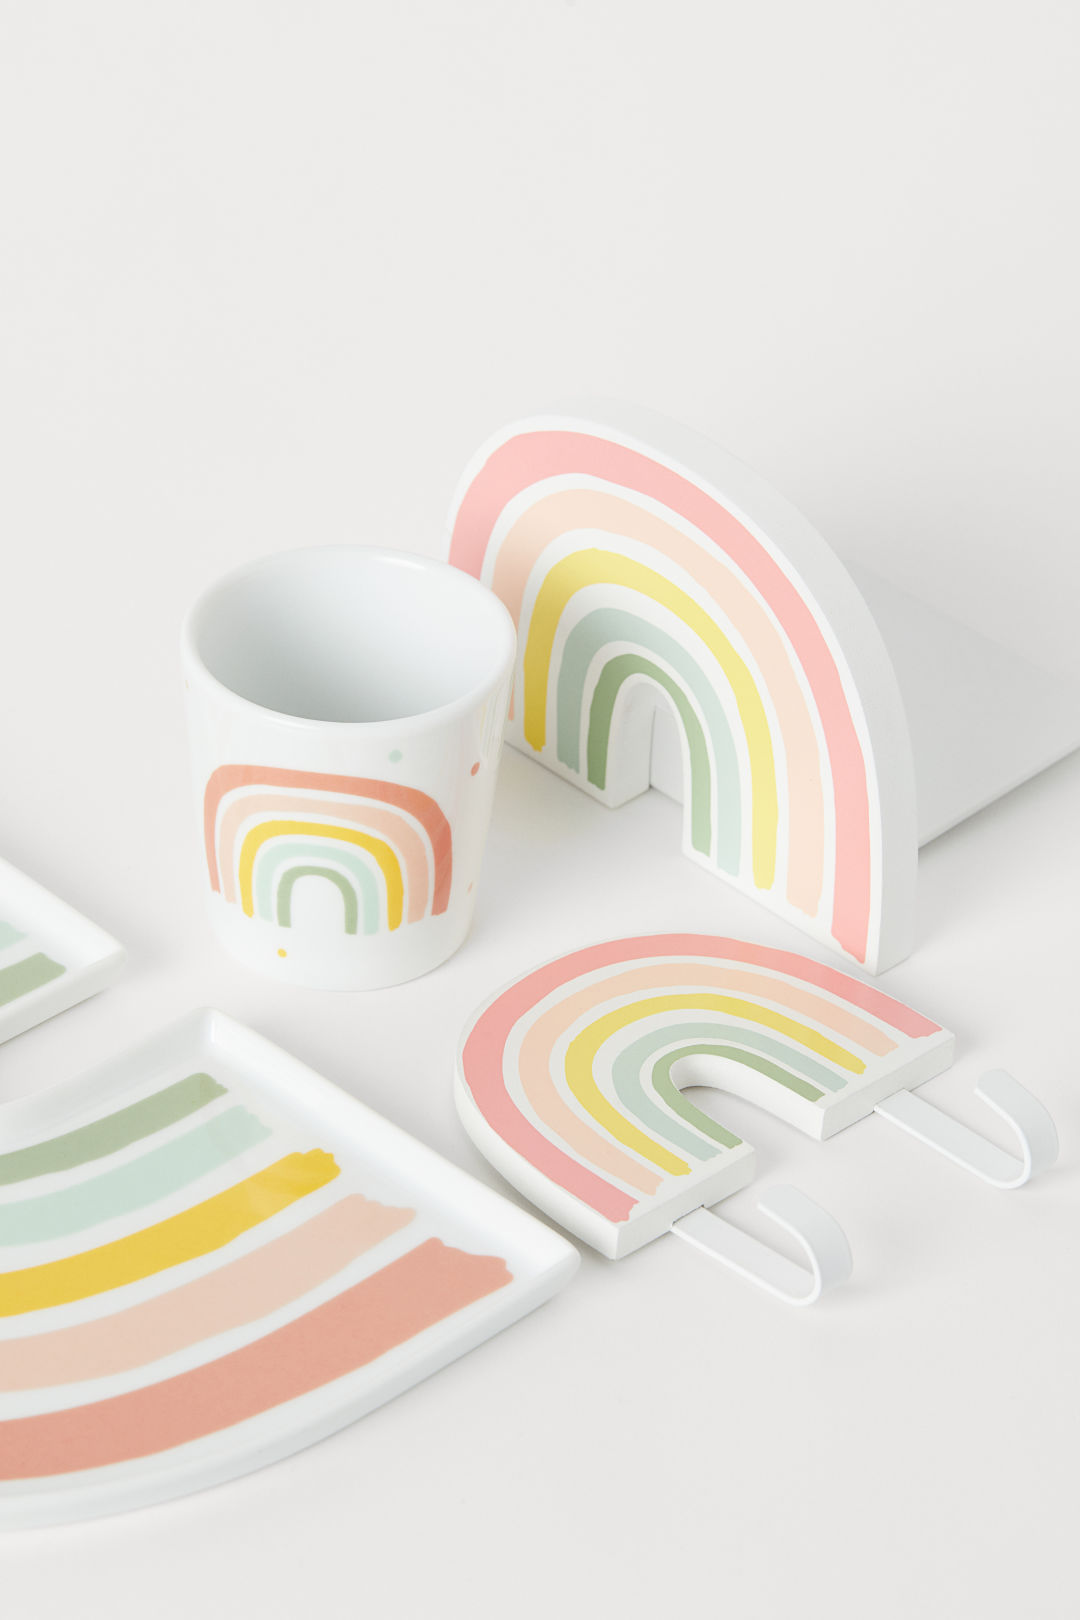 Rainbow merchandise from H&M